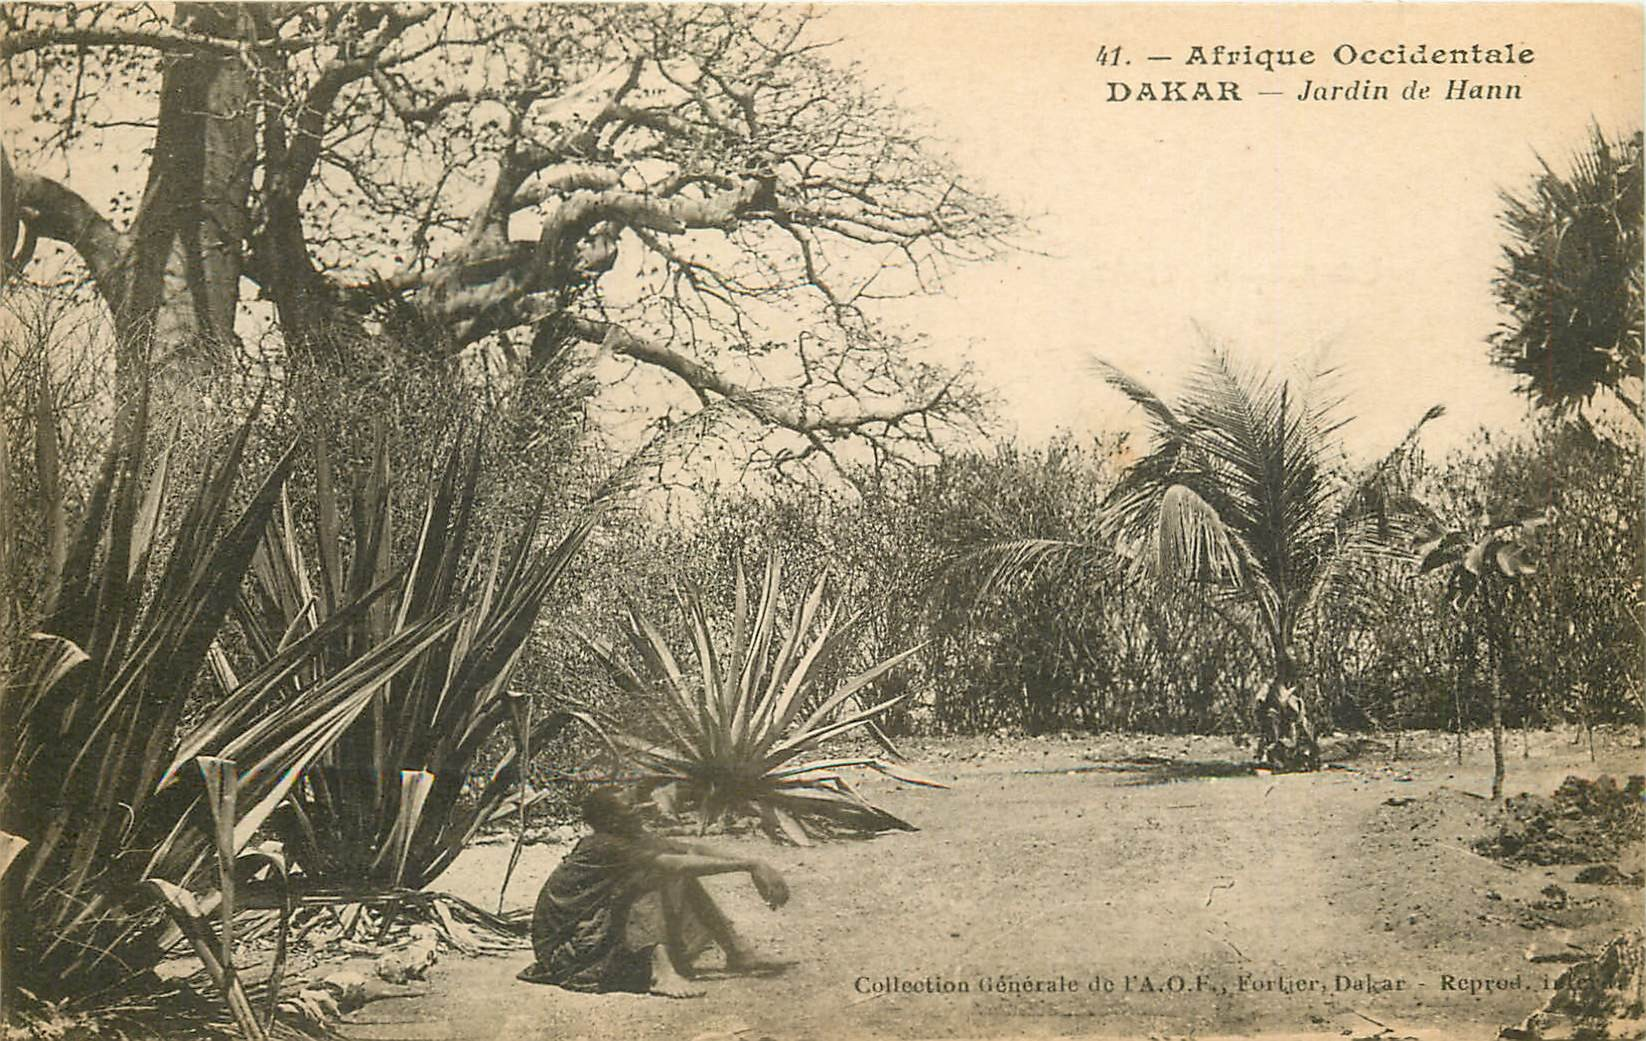 DAKAR. Jardin de Hann 1930 en Afrique